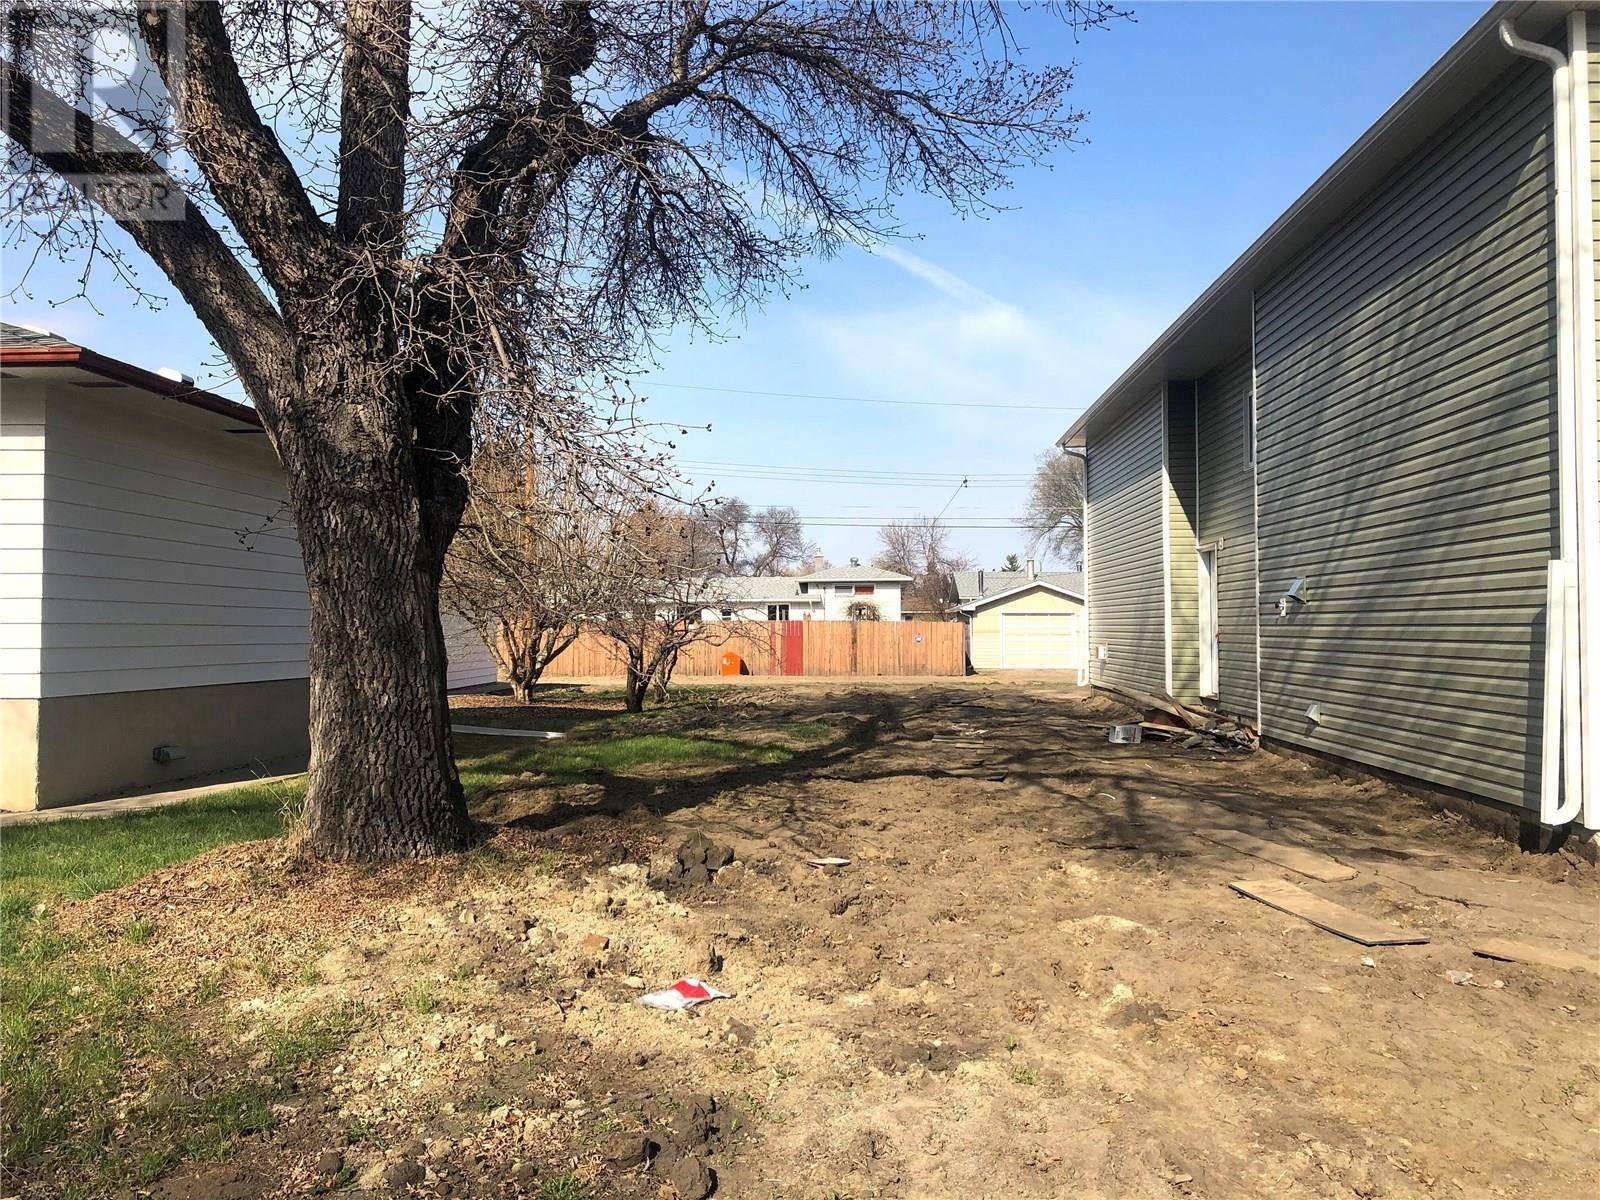 Residential property for sale at 223 X Ave N Saskatoon Saskatchewan - MLS: SK797325